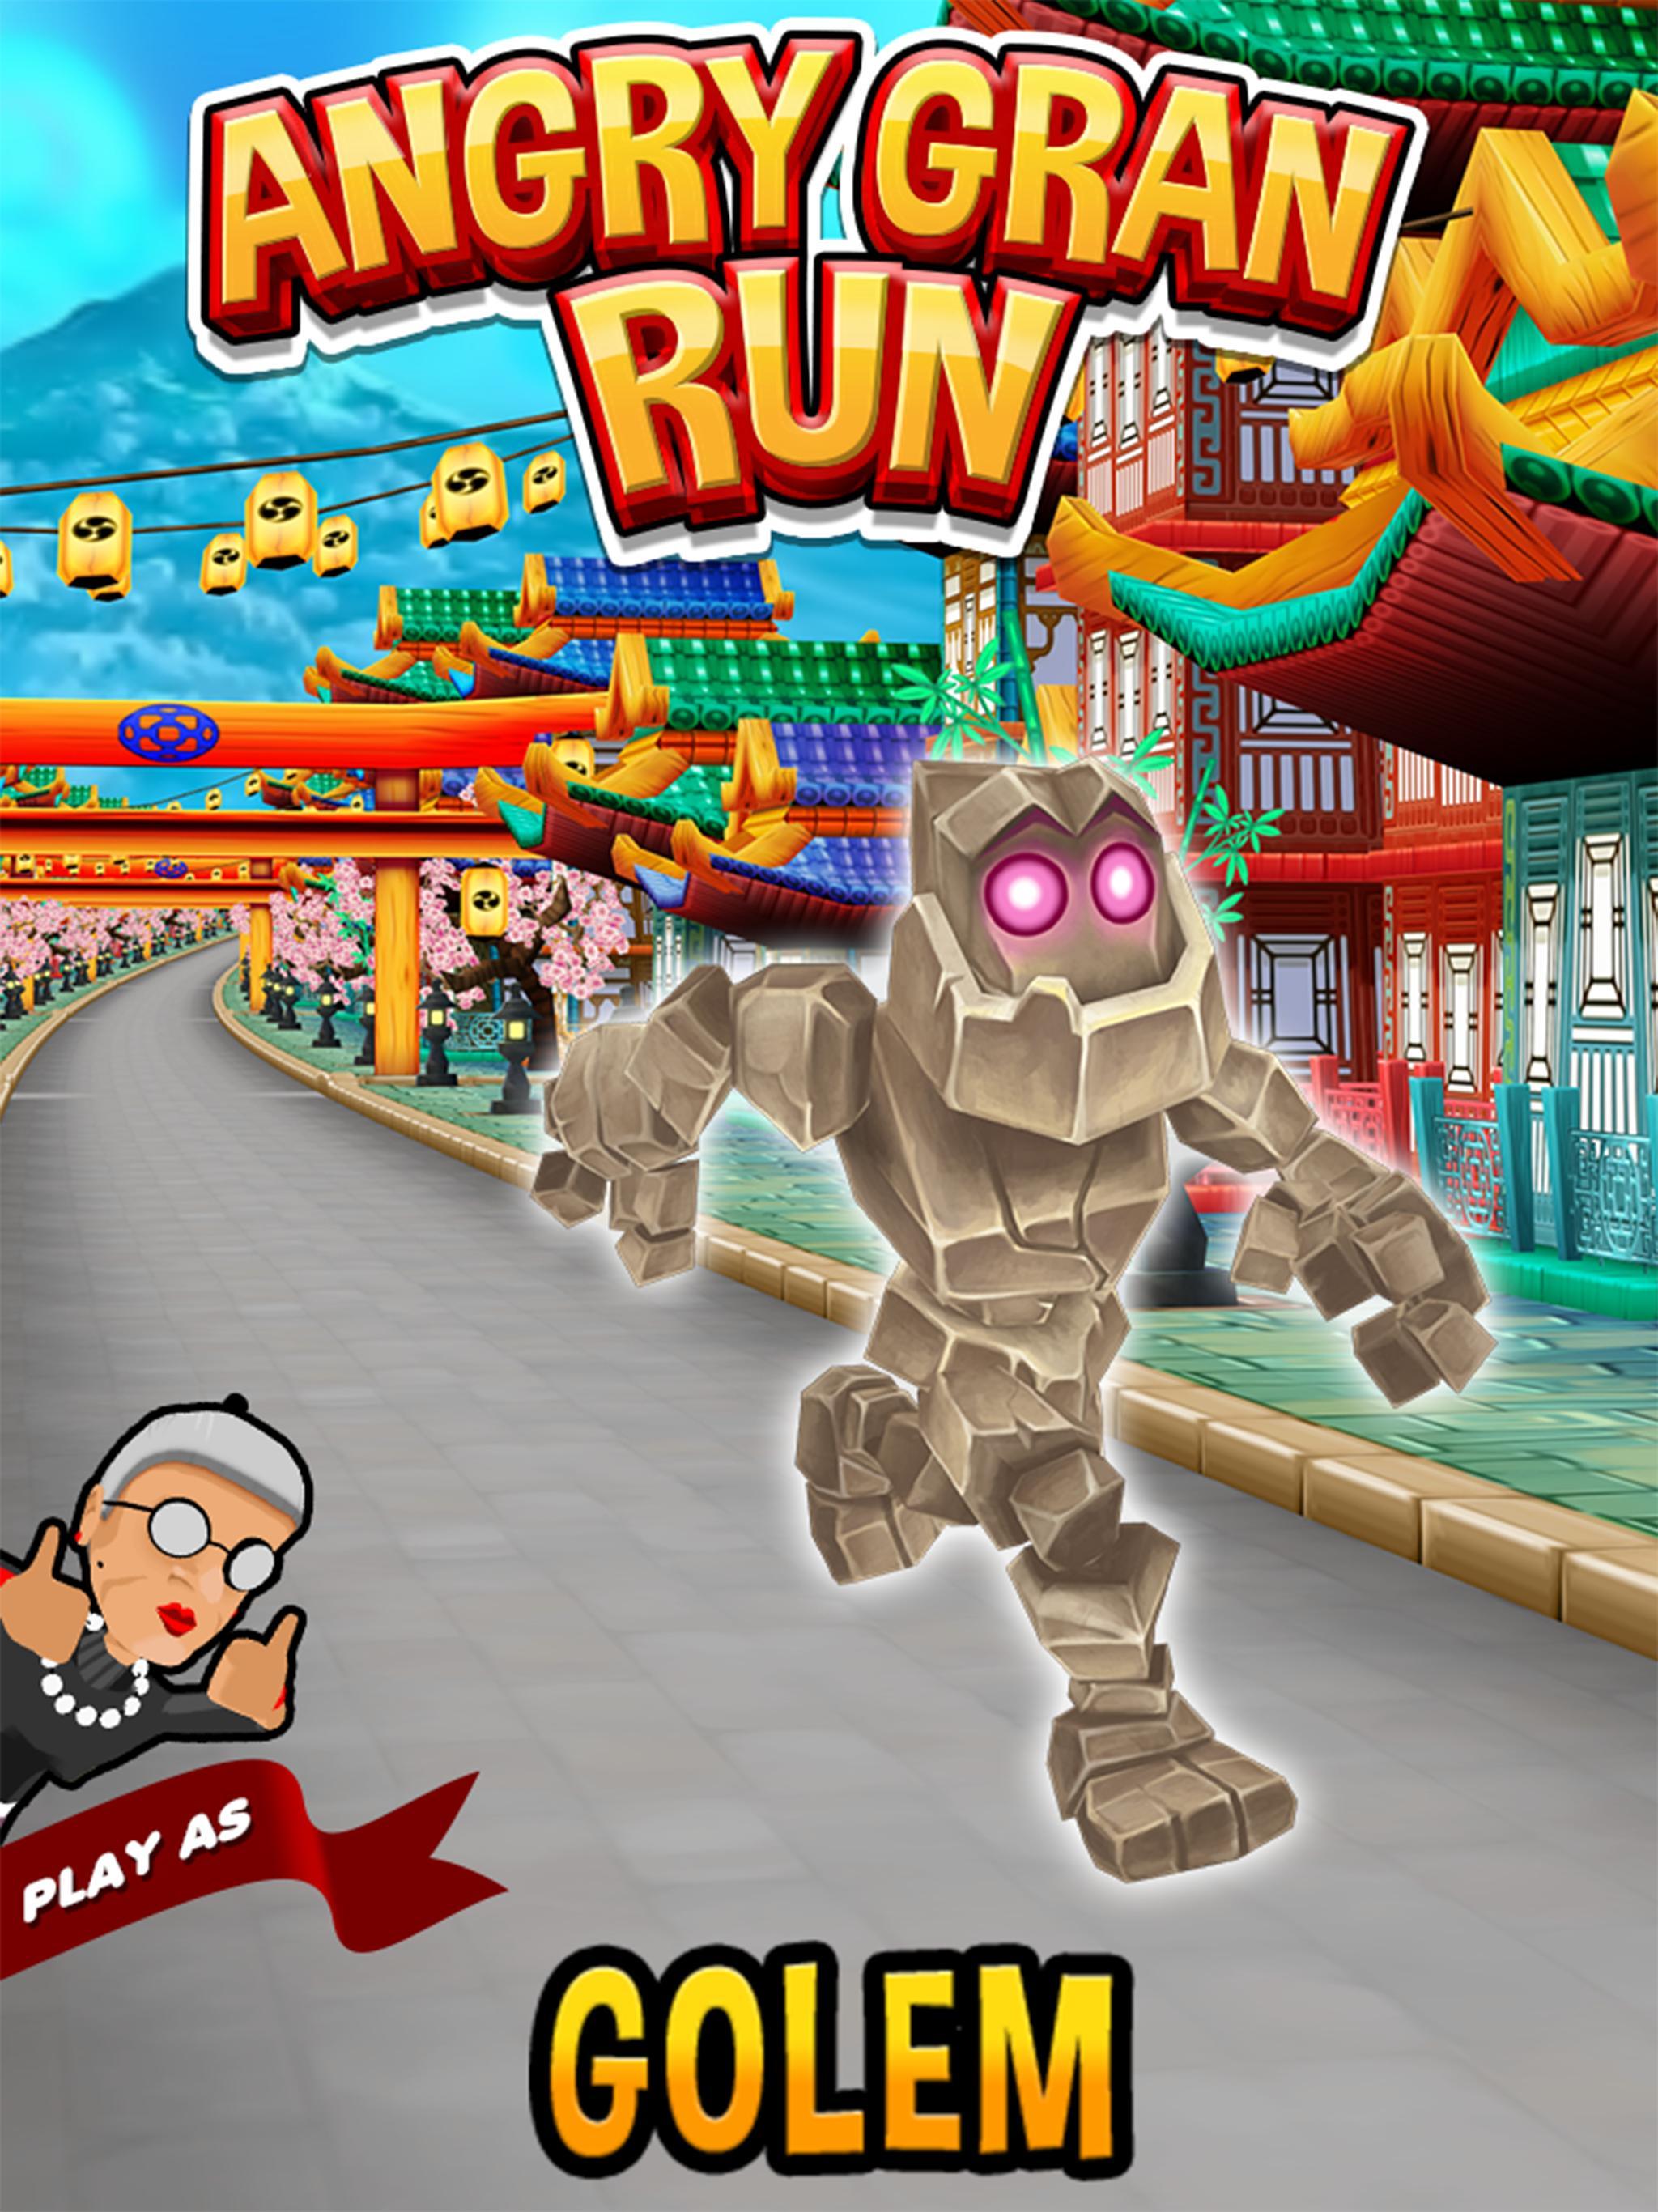 Angry Gran Run Running Game 2.12.1 Screenshot 13